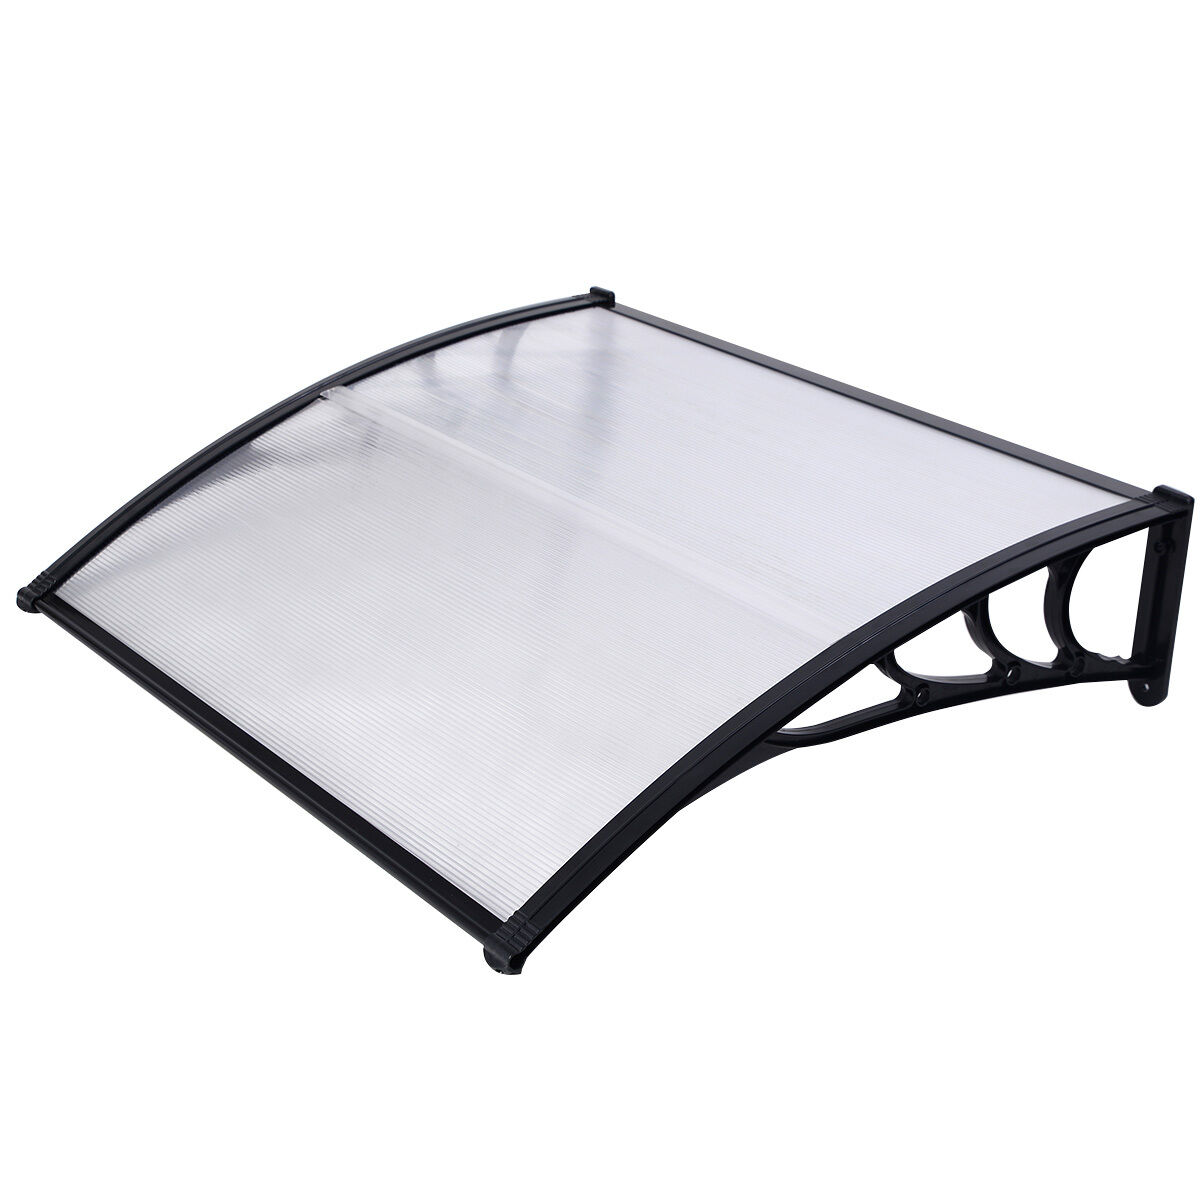 marquise de porte transparent 120 x 100 cm. Black Bedroom Furniture Sets. Home Design Ideas